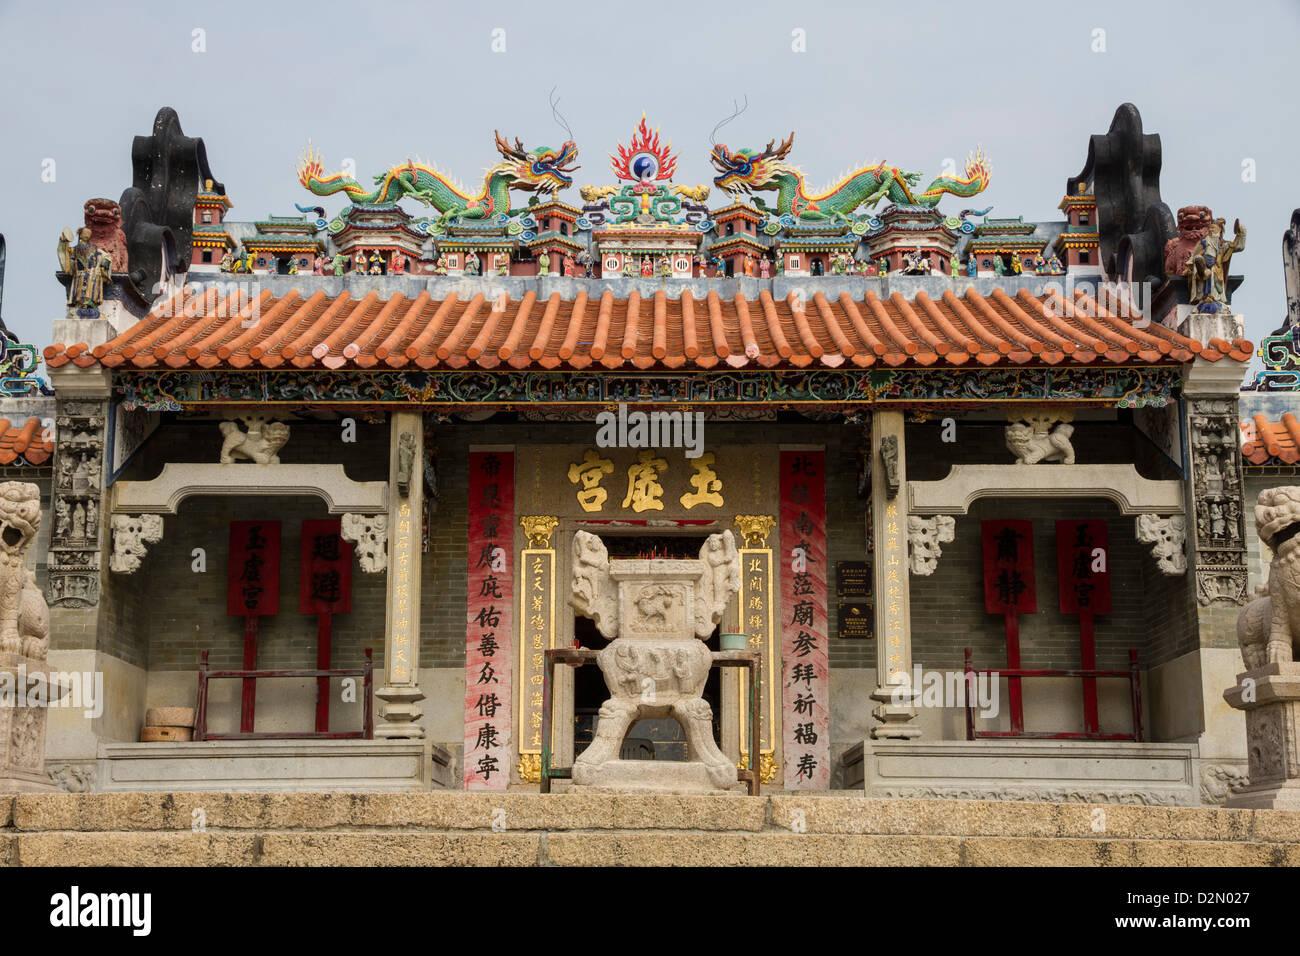 Pak Tai temple, Cheung Chau island, Hong Kong, China, Asia - Stock Image